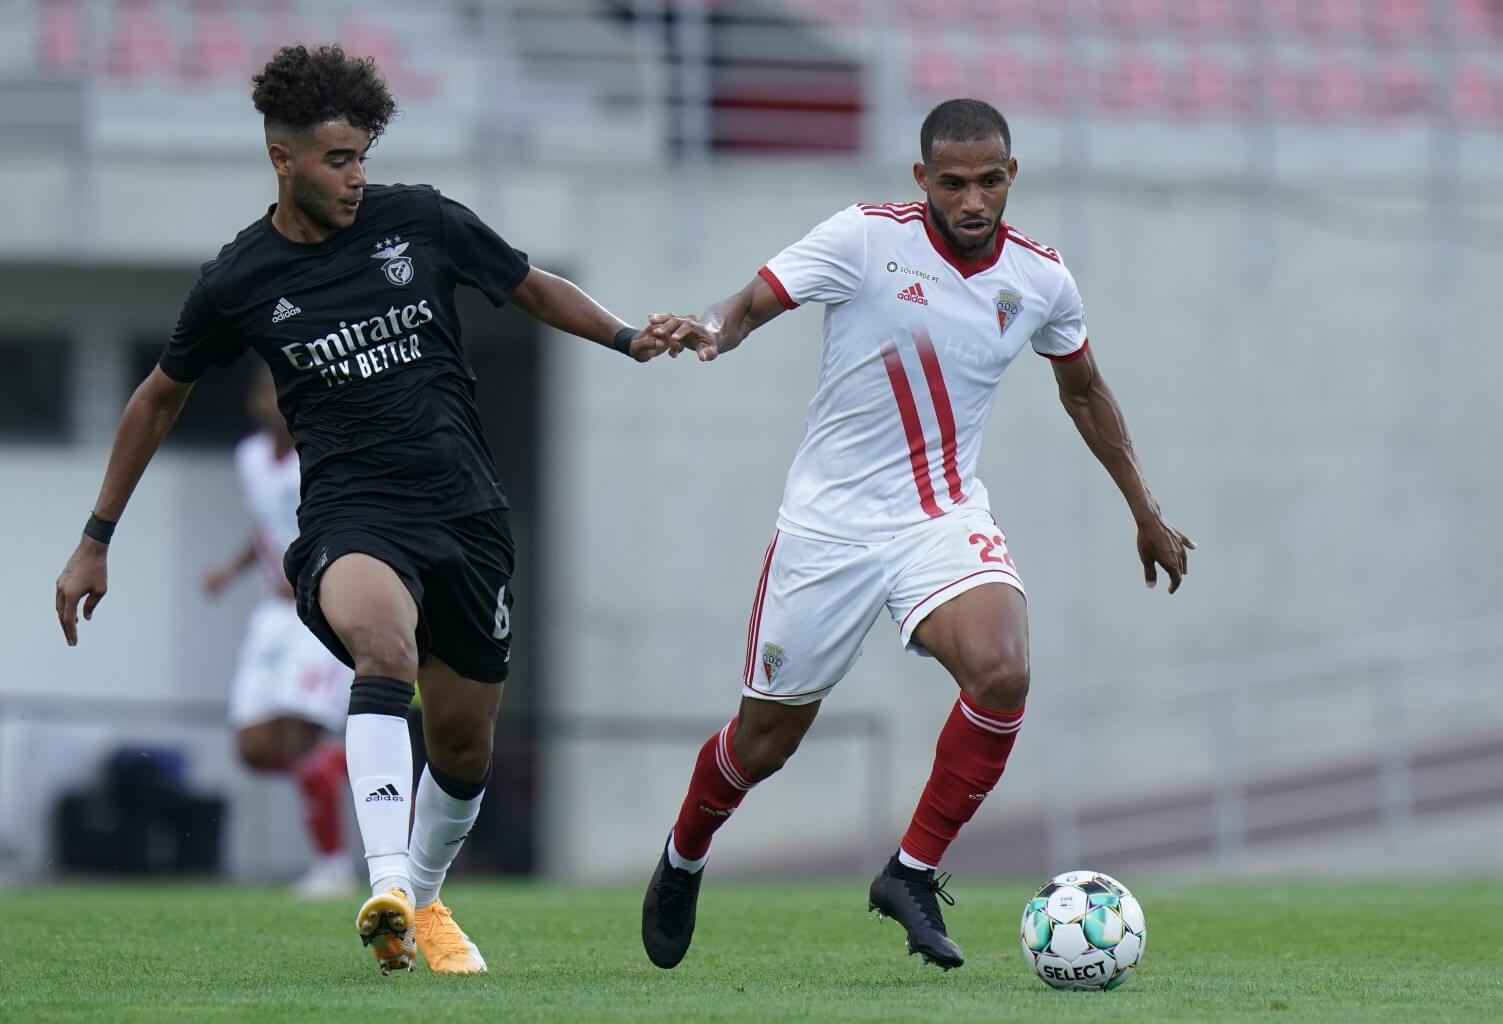 SL Benfica B – UD Vilafranquense